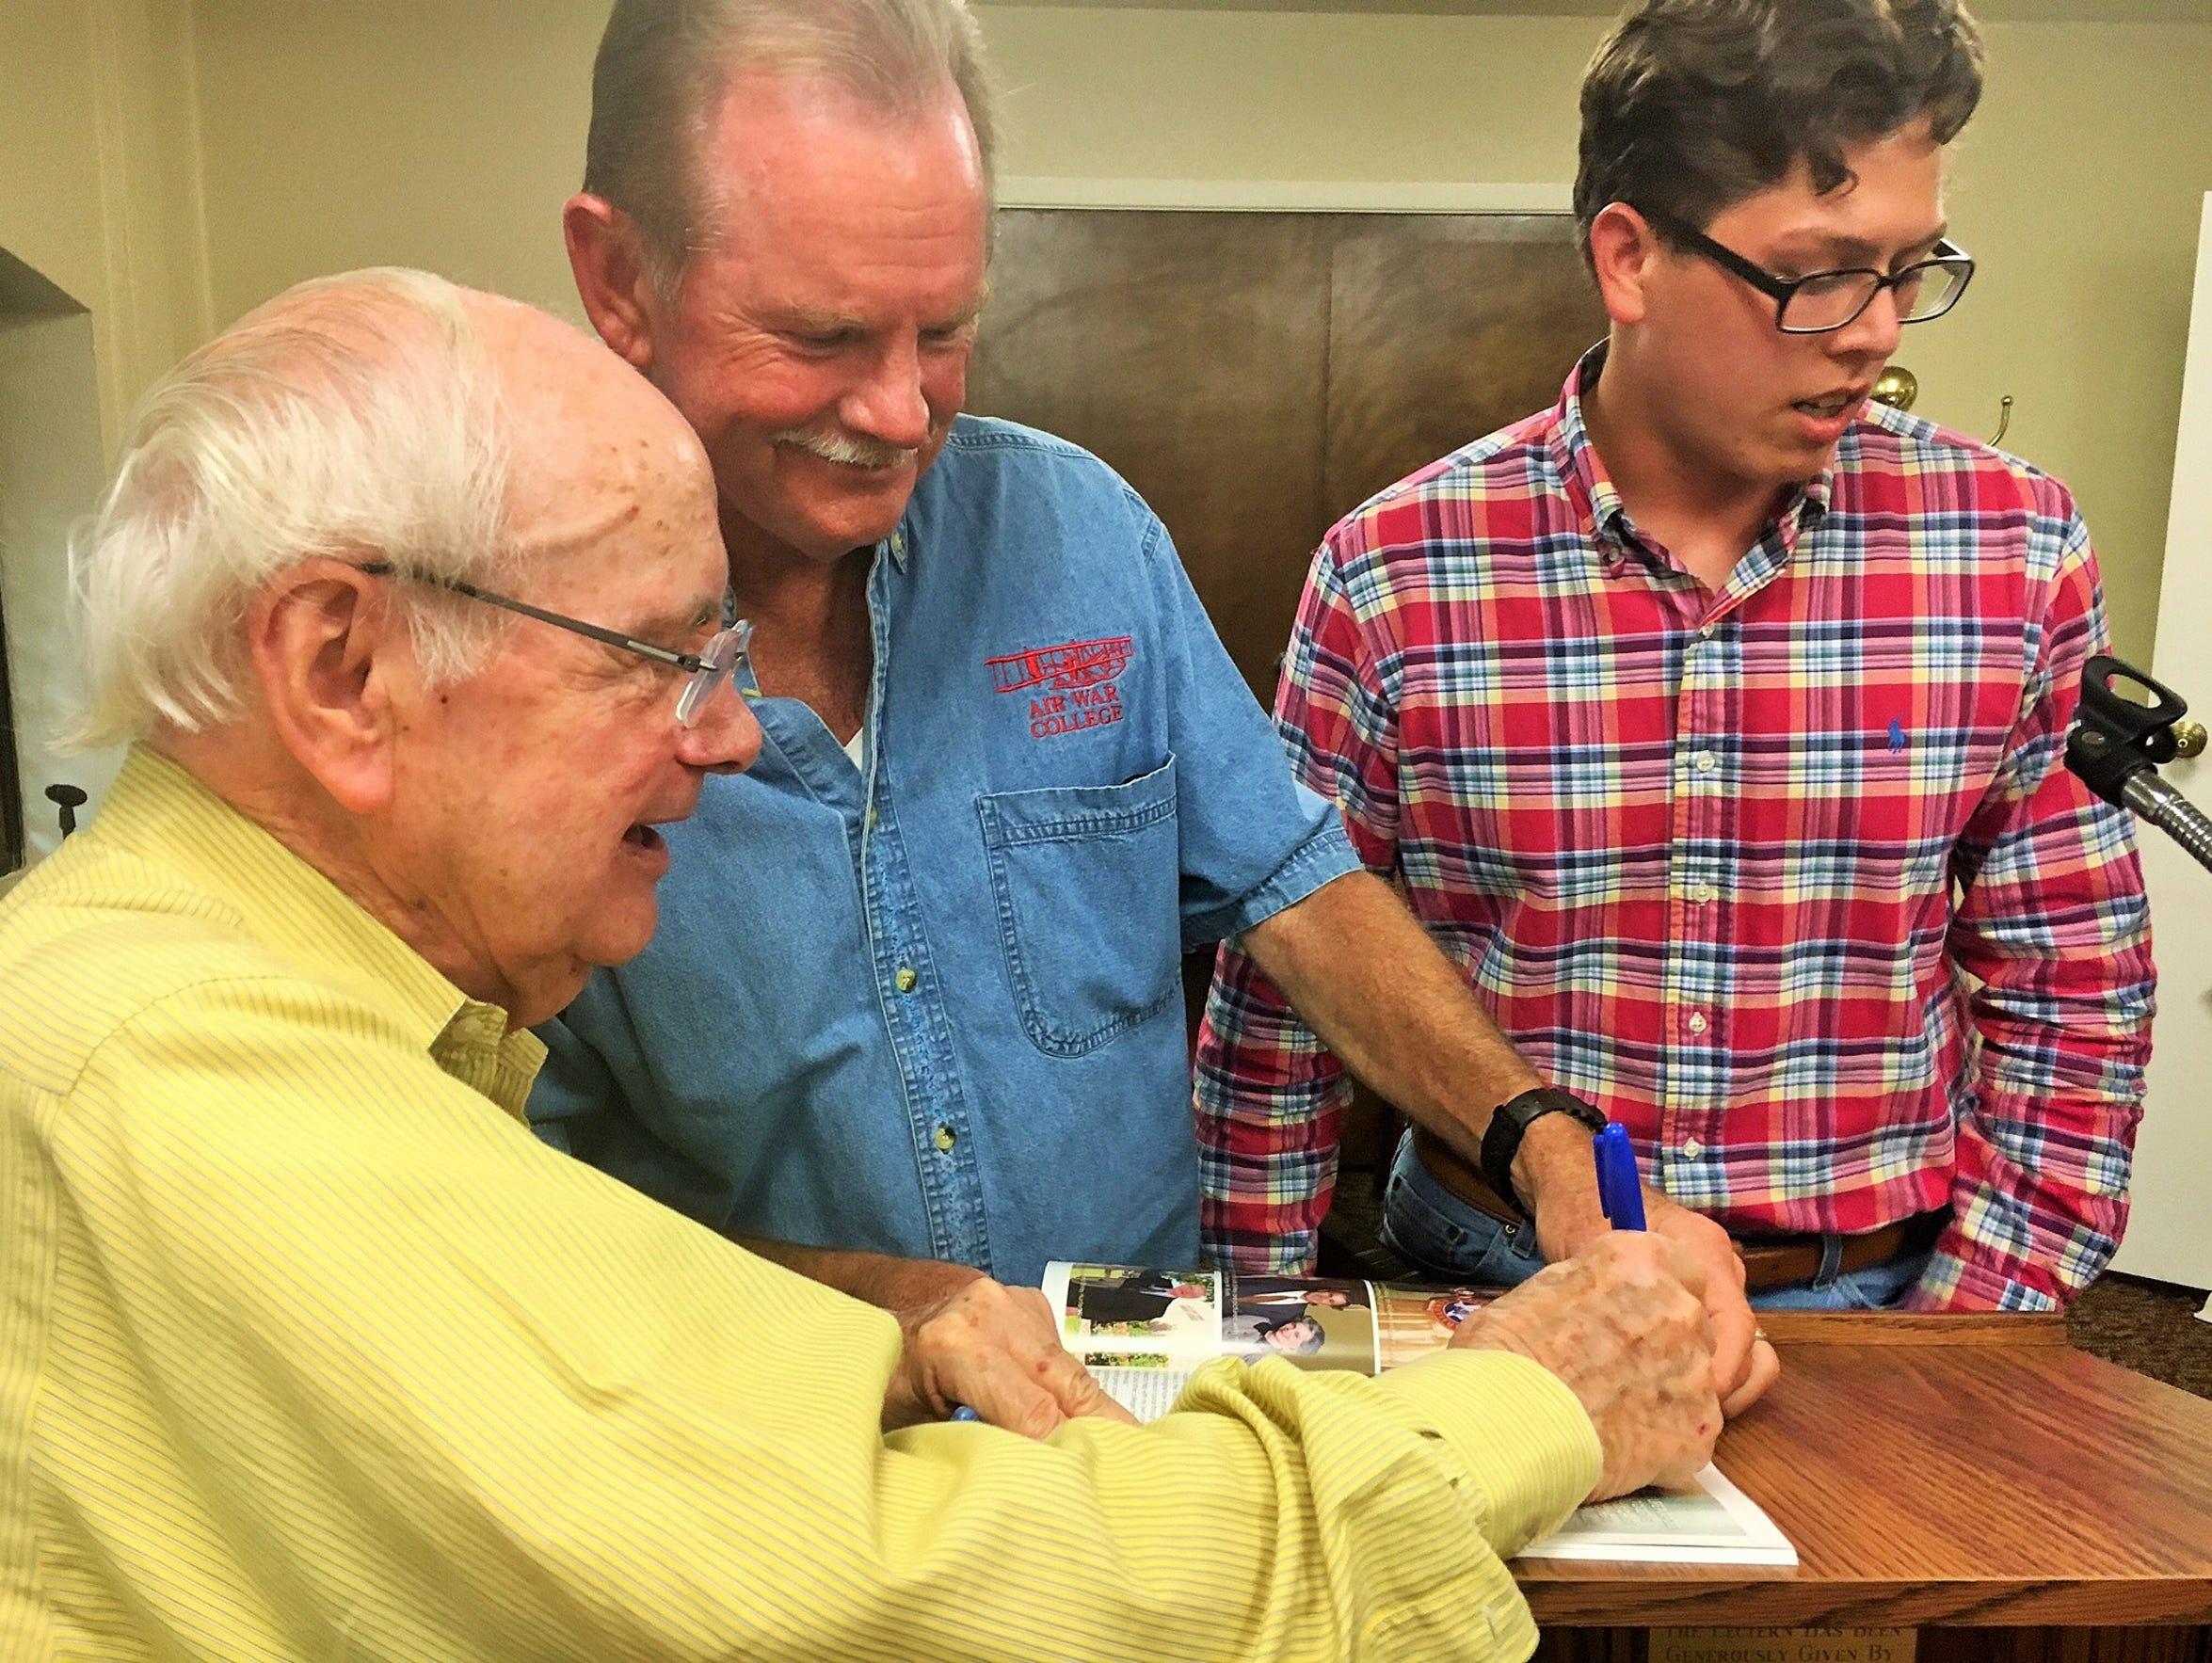 Bob Hunter, Larry Sanders, and Jacob Dukes, the current